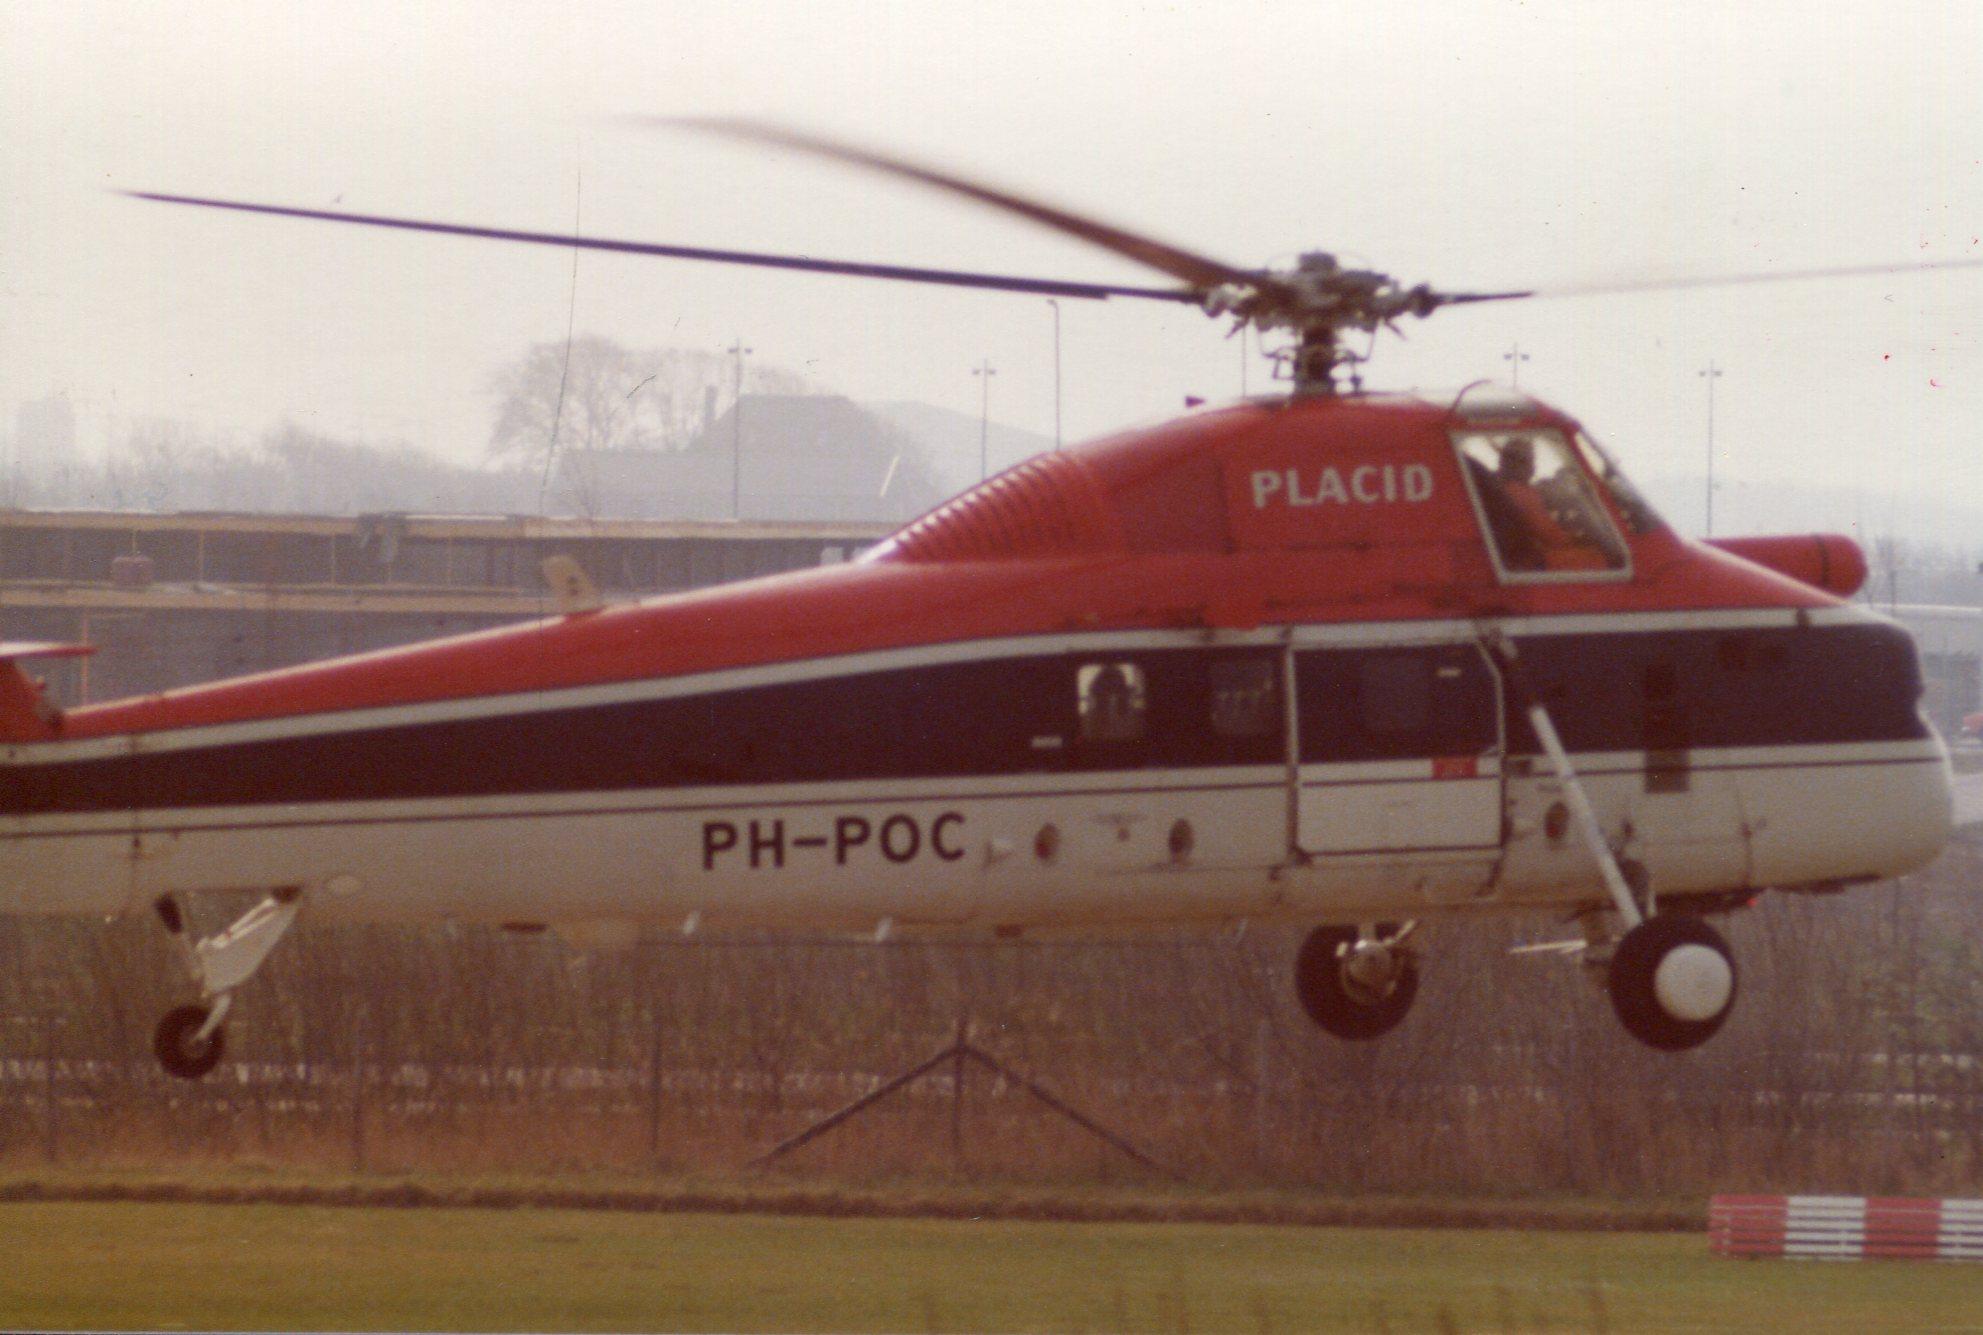 Naam: Den Helder , april 1977.jpg Bekeken: 222 Grootte: 279,4 KB